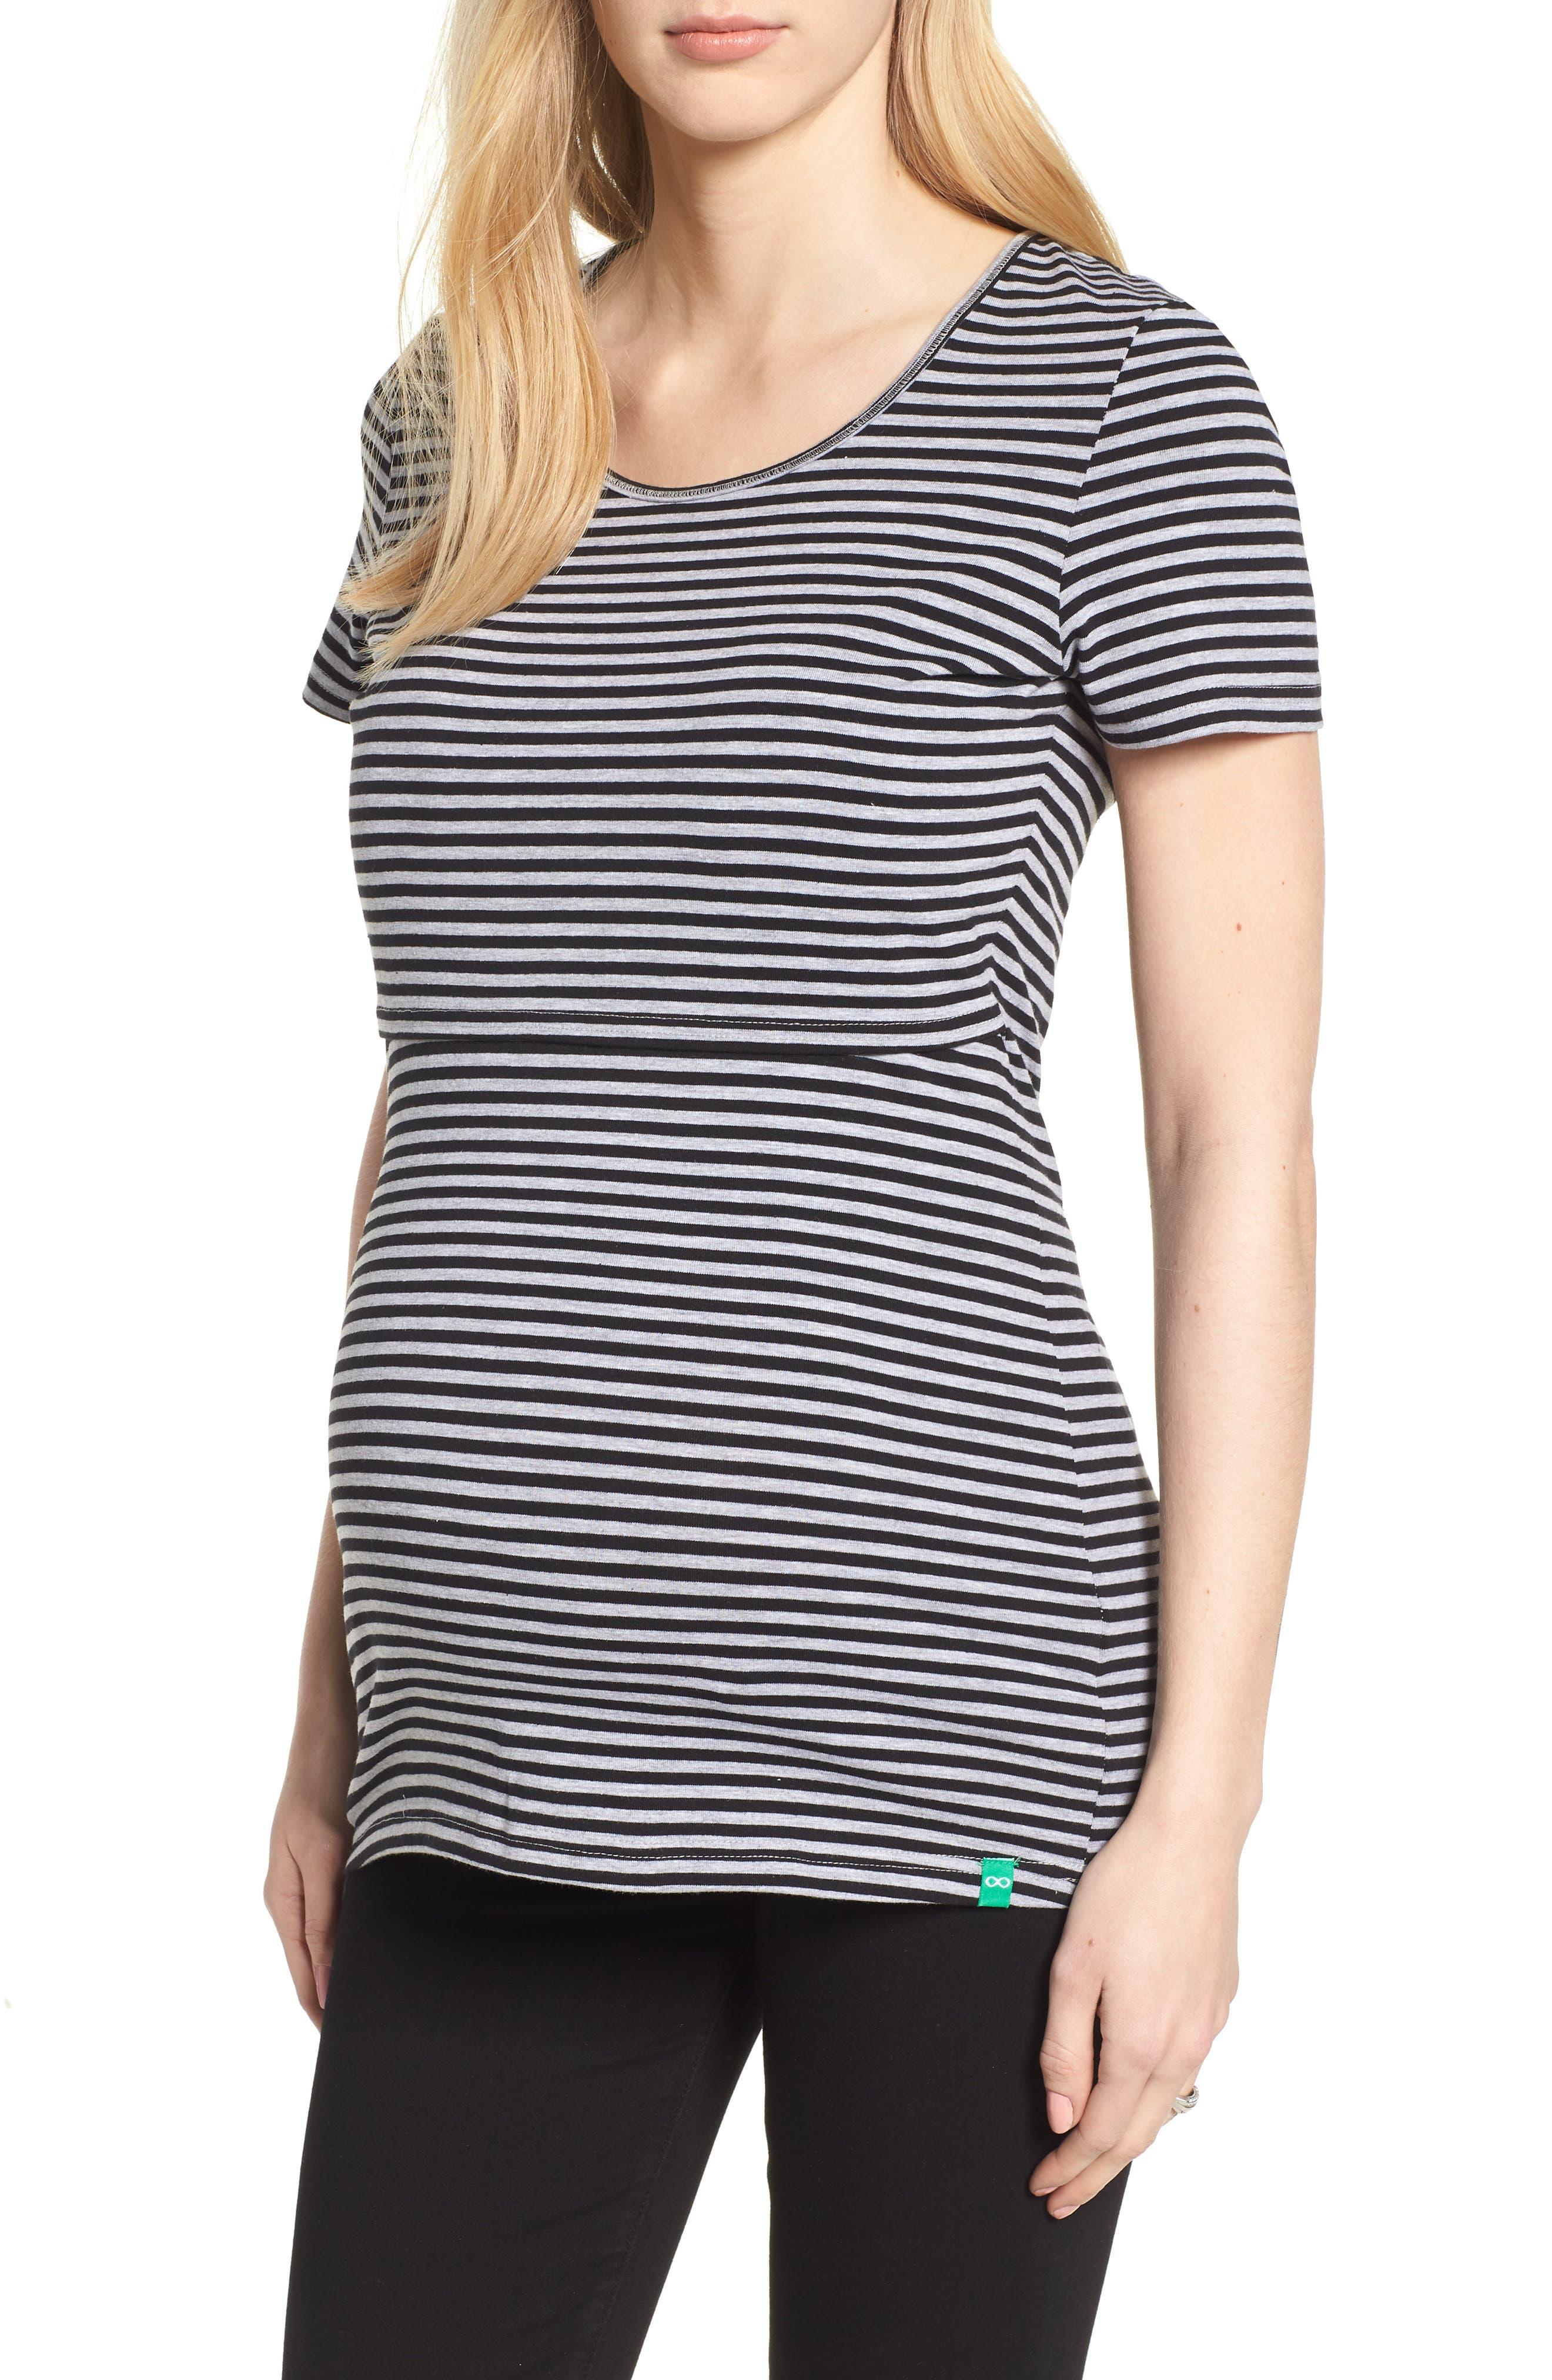 MODERN ETERNITY Maternity/Nursing Tee, Main, color, GREY/ BLACK